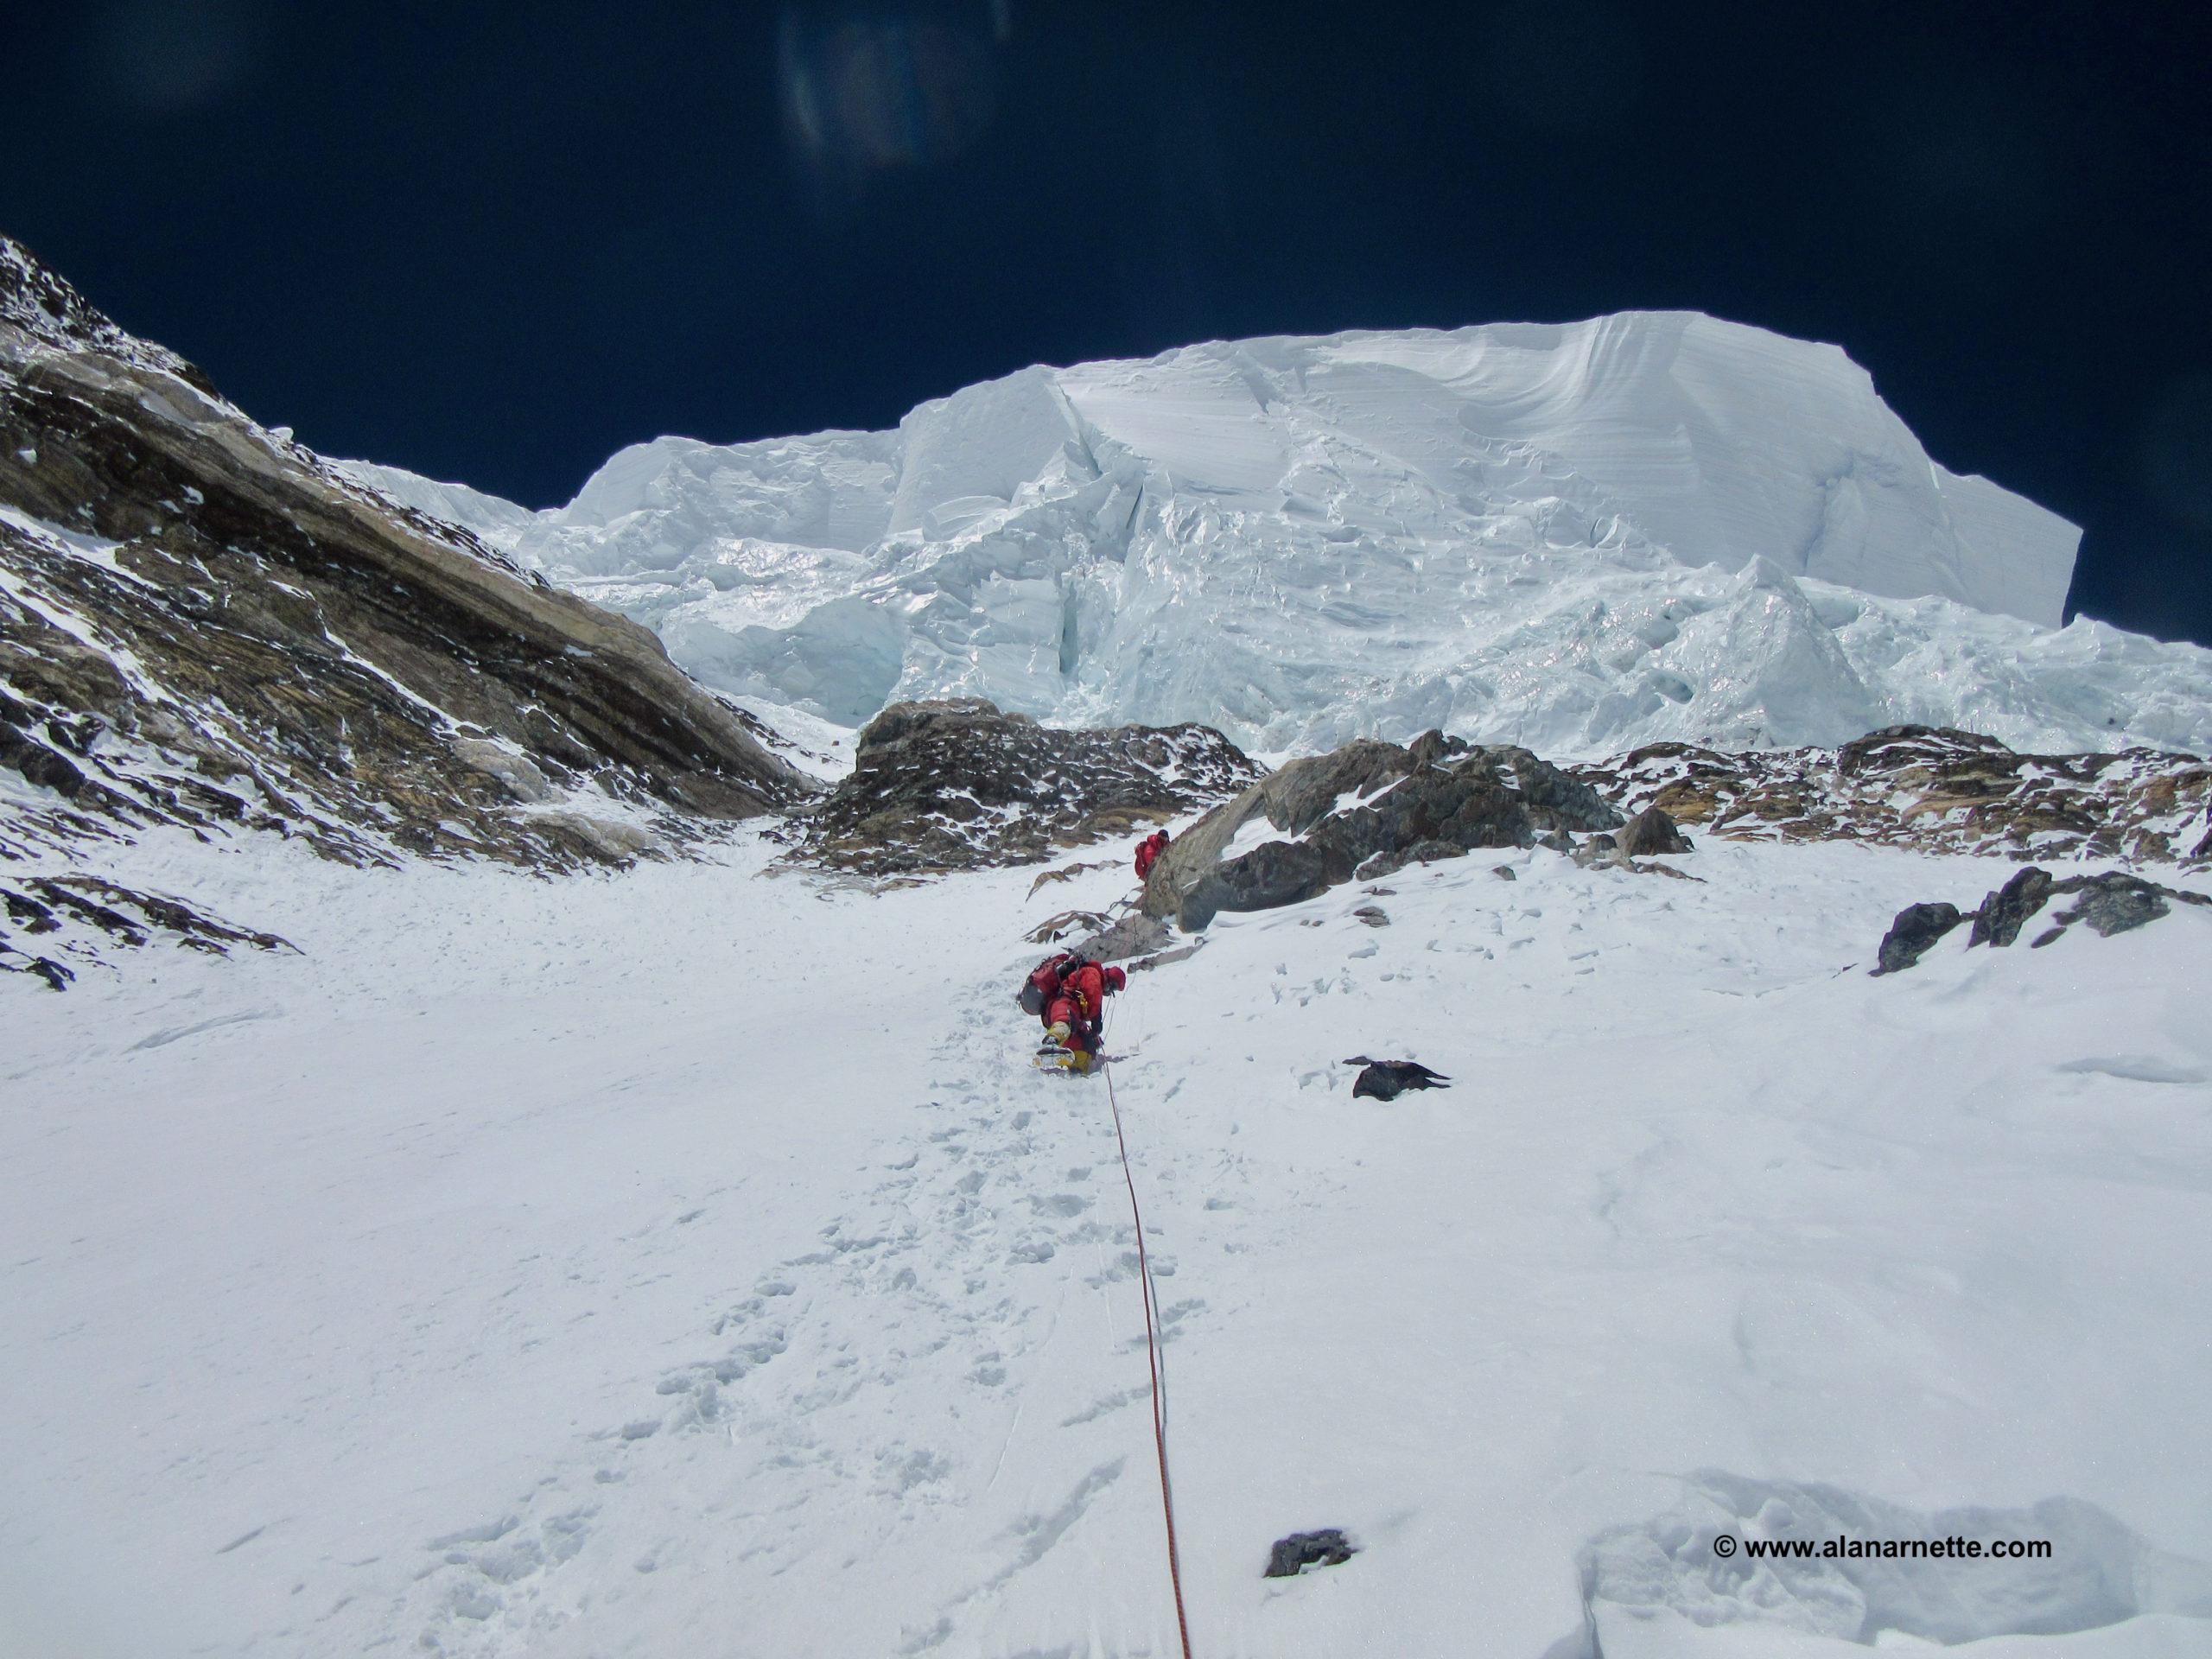 Approaching the Bottleneck Above K2 C4 2014 © www.alanarnette.com